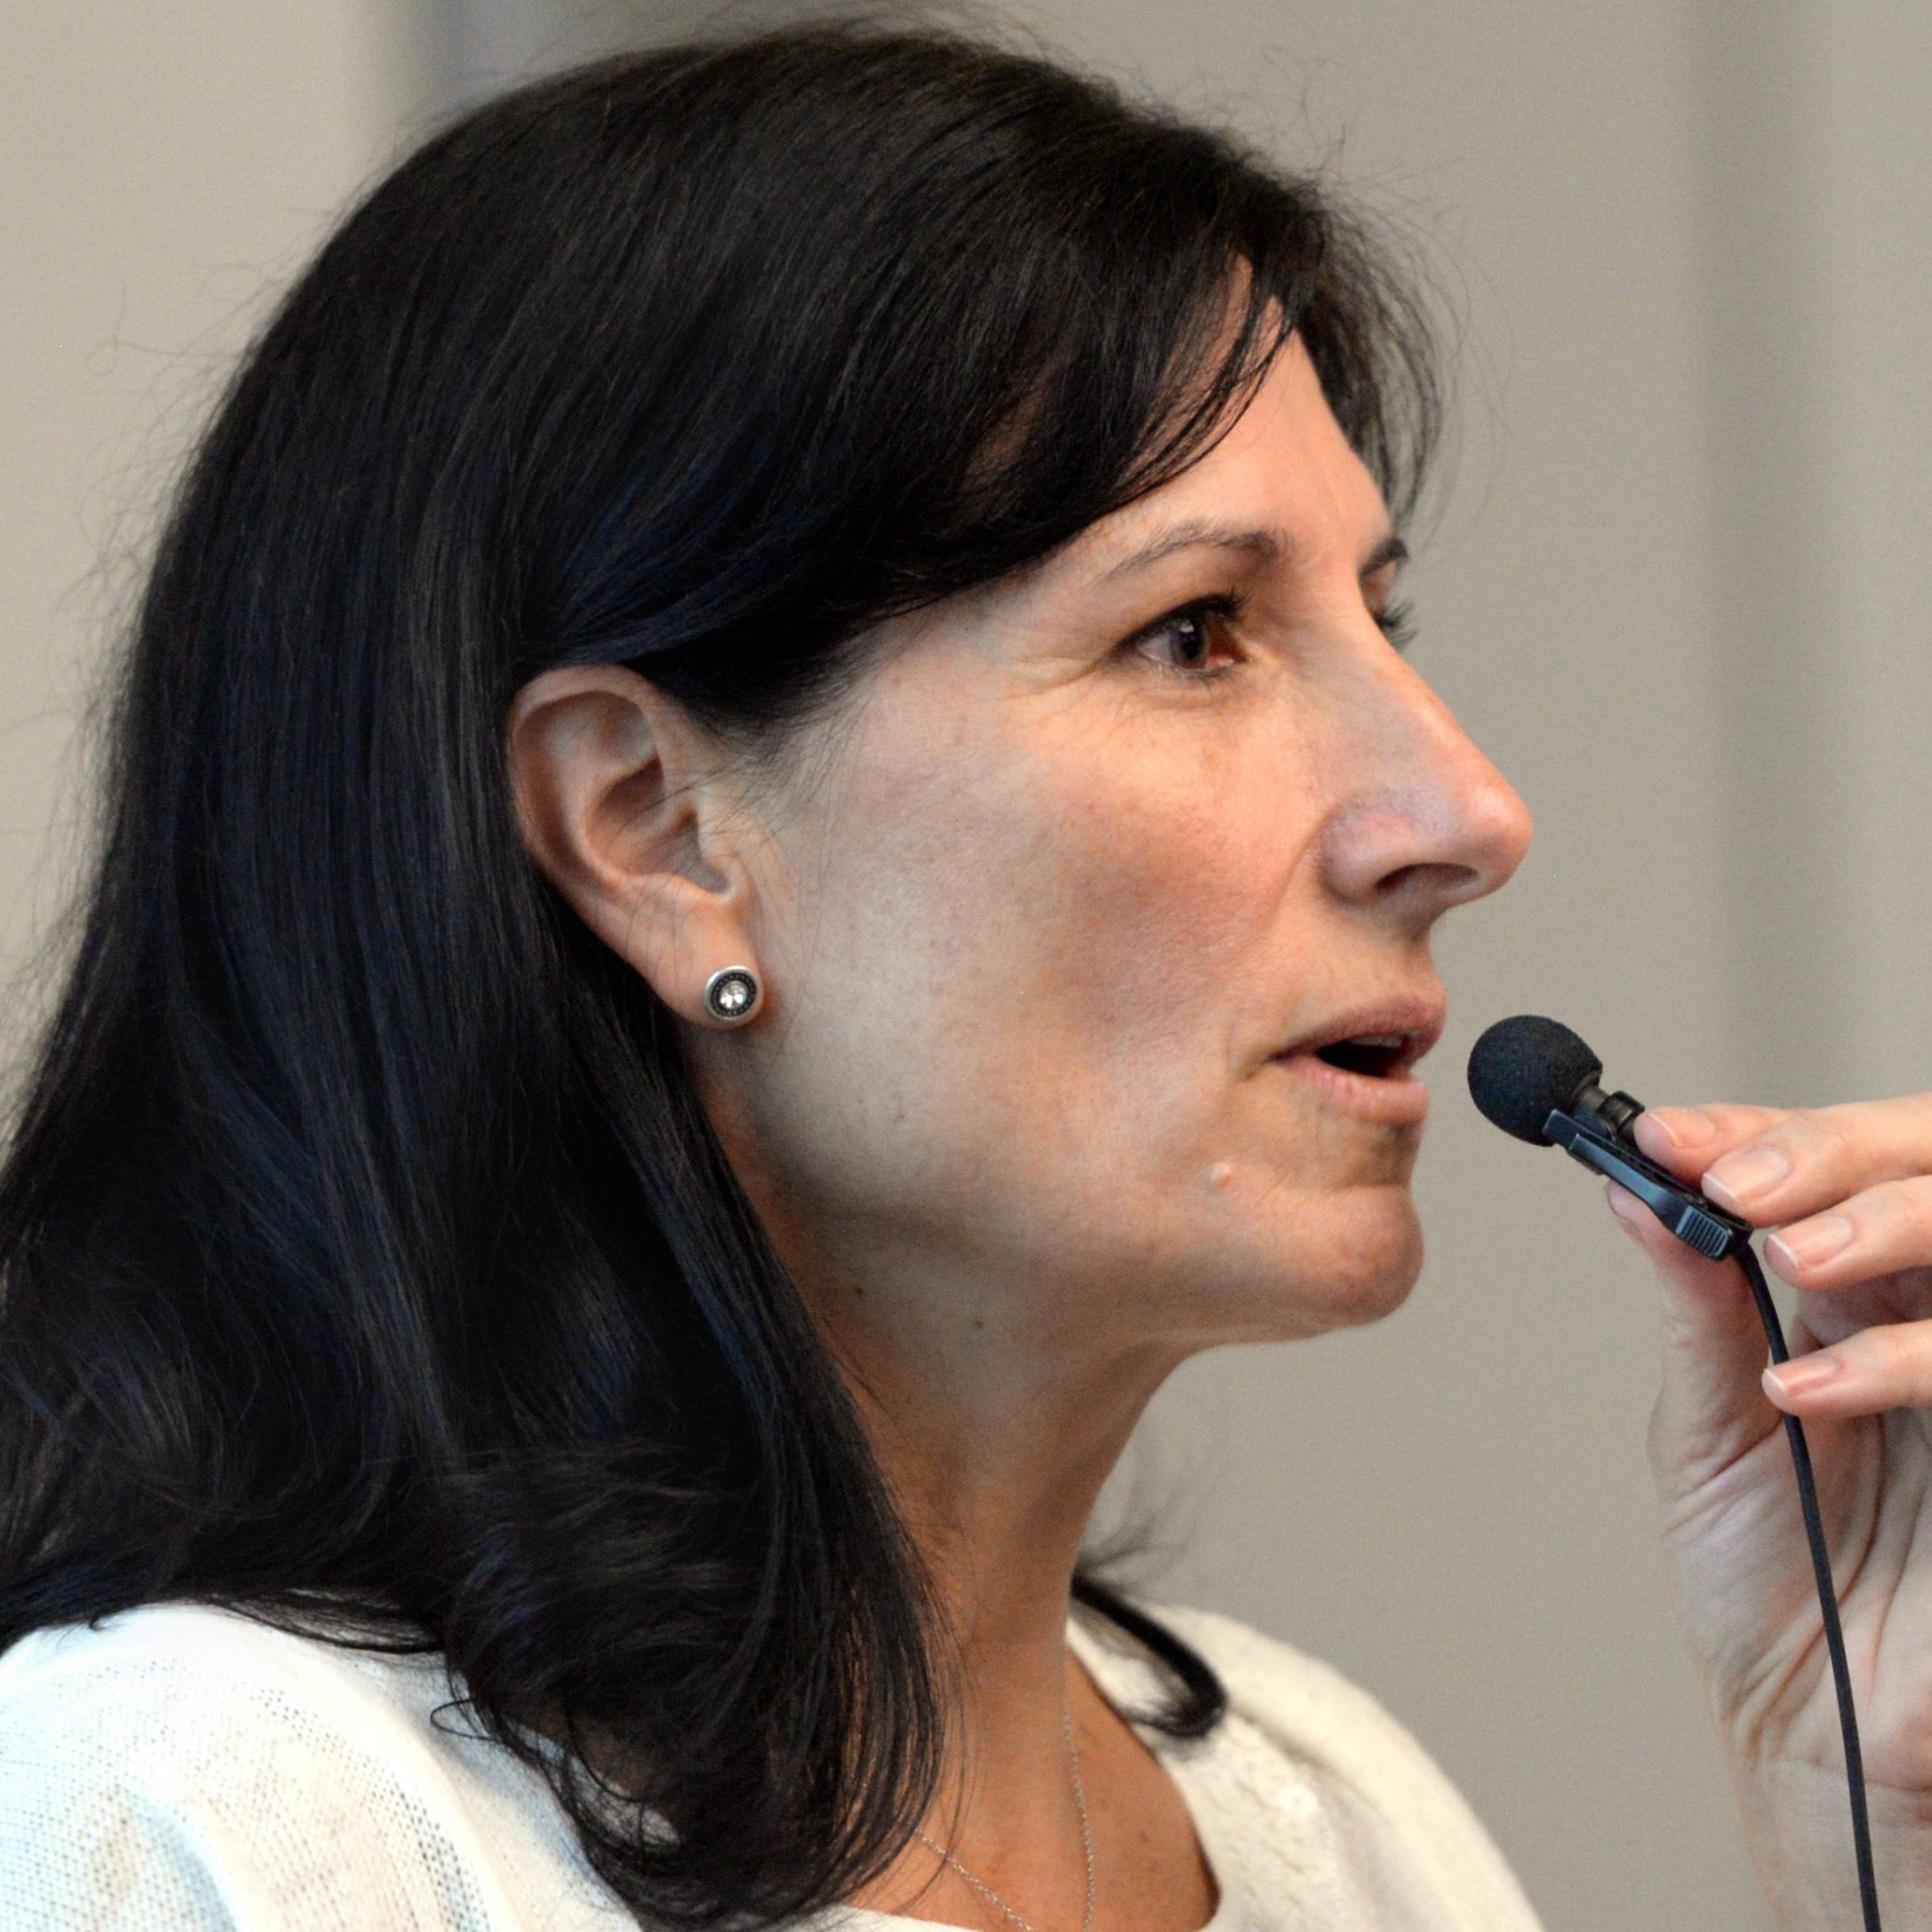 SUSAN JENKINS PhD- Managing Director at UC Berkeley Bakar Fellows Program